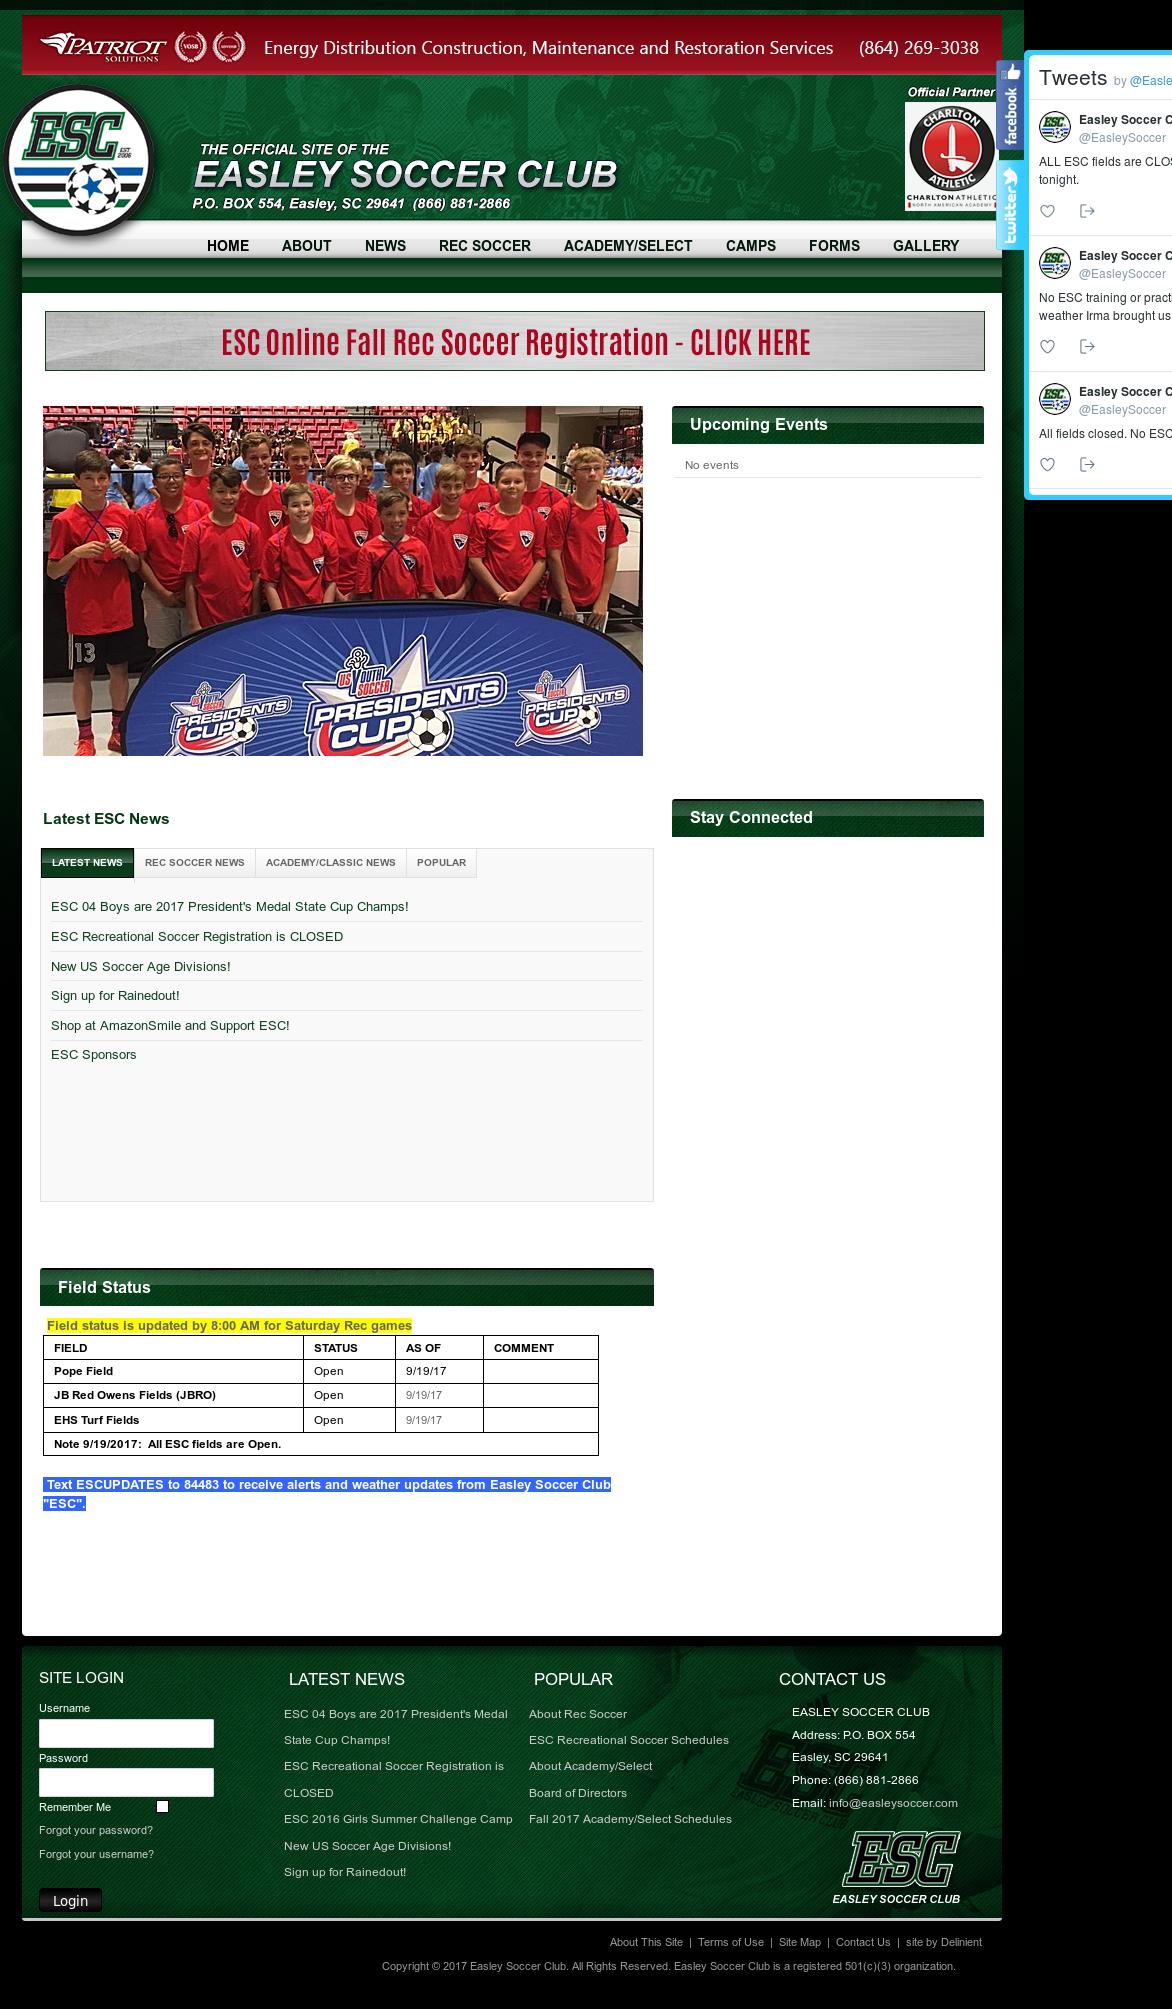 666f6f2c5 See screenshot ». May 2017. See screenshot ». + See more website history.  Owler has collected 11 screenshots of Easley Soccer Club s ...